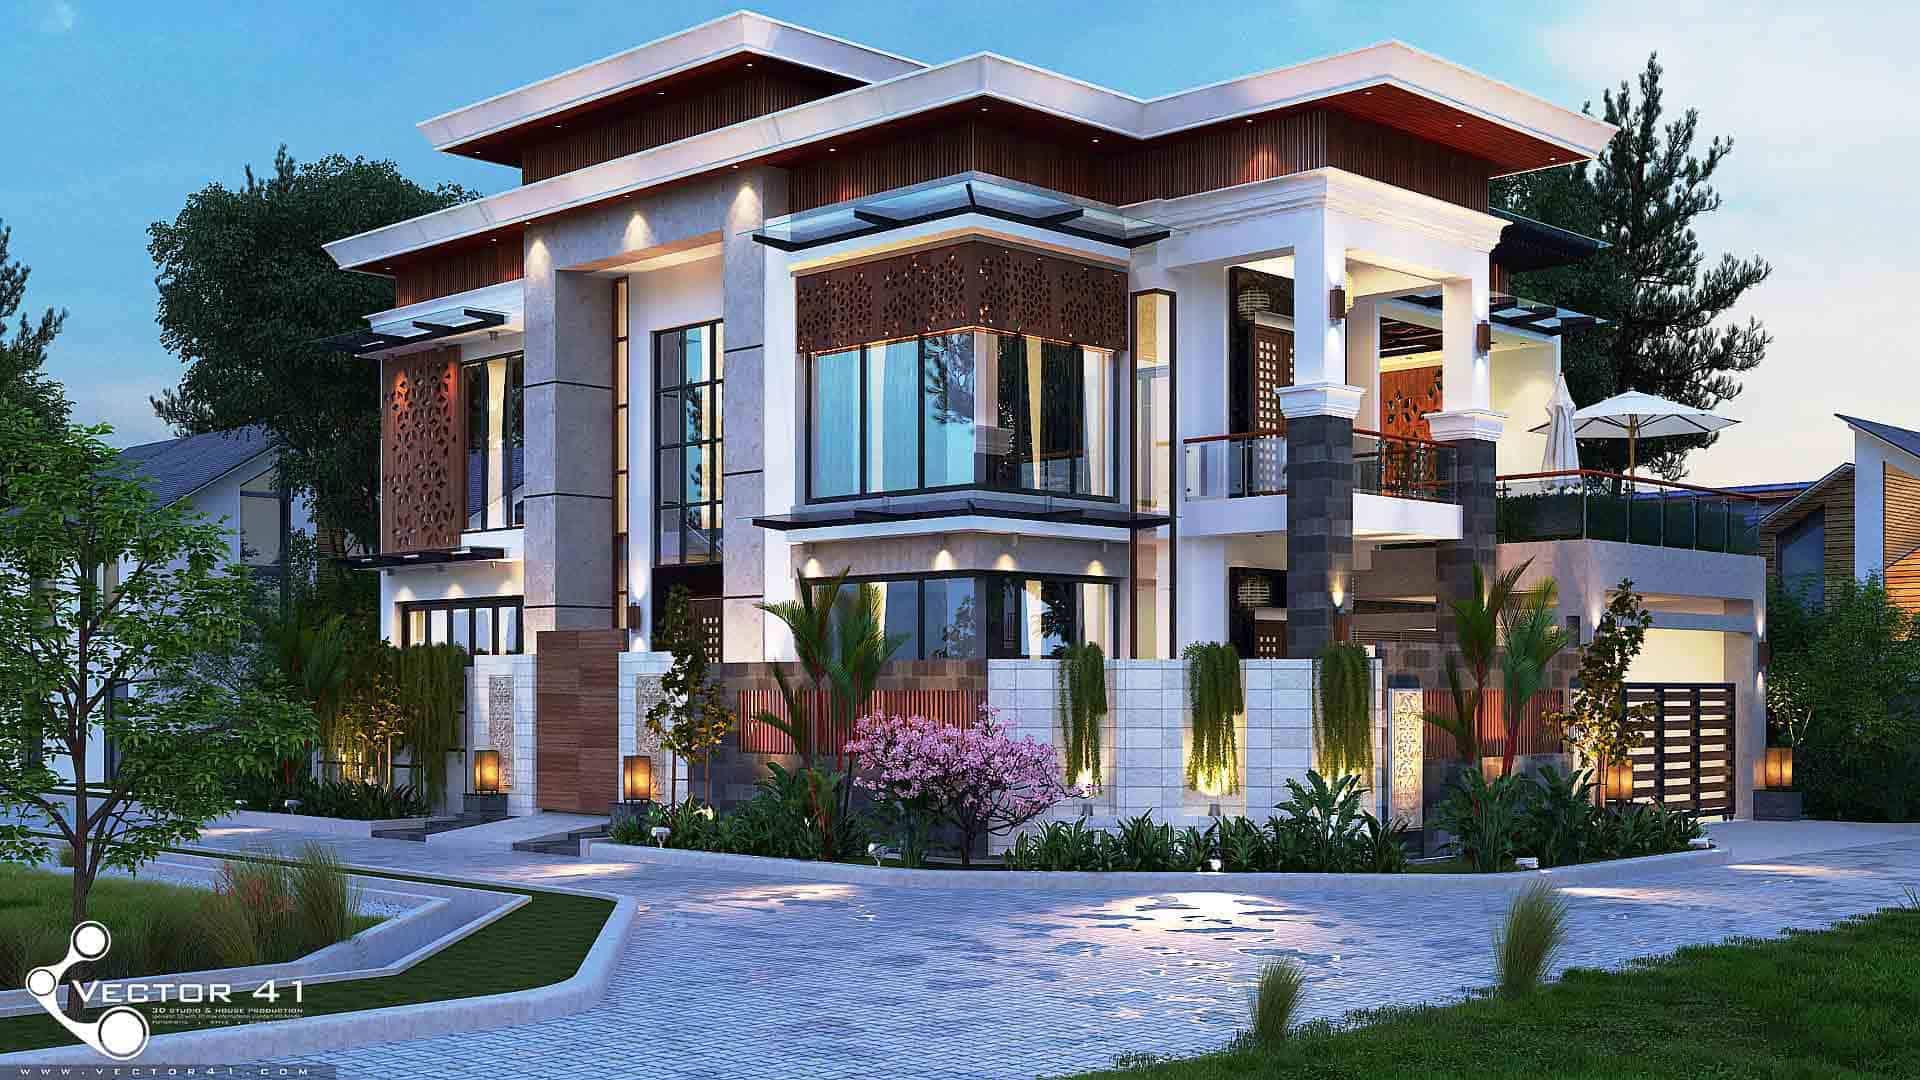 Desain Villa Model Villa Terbaru